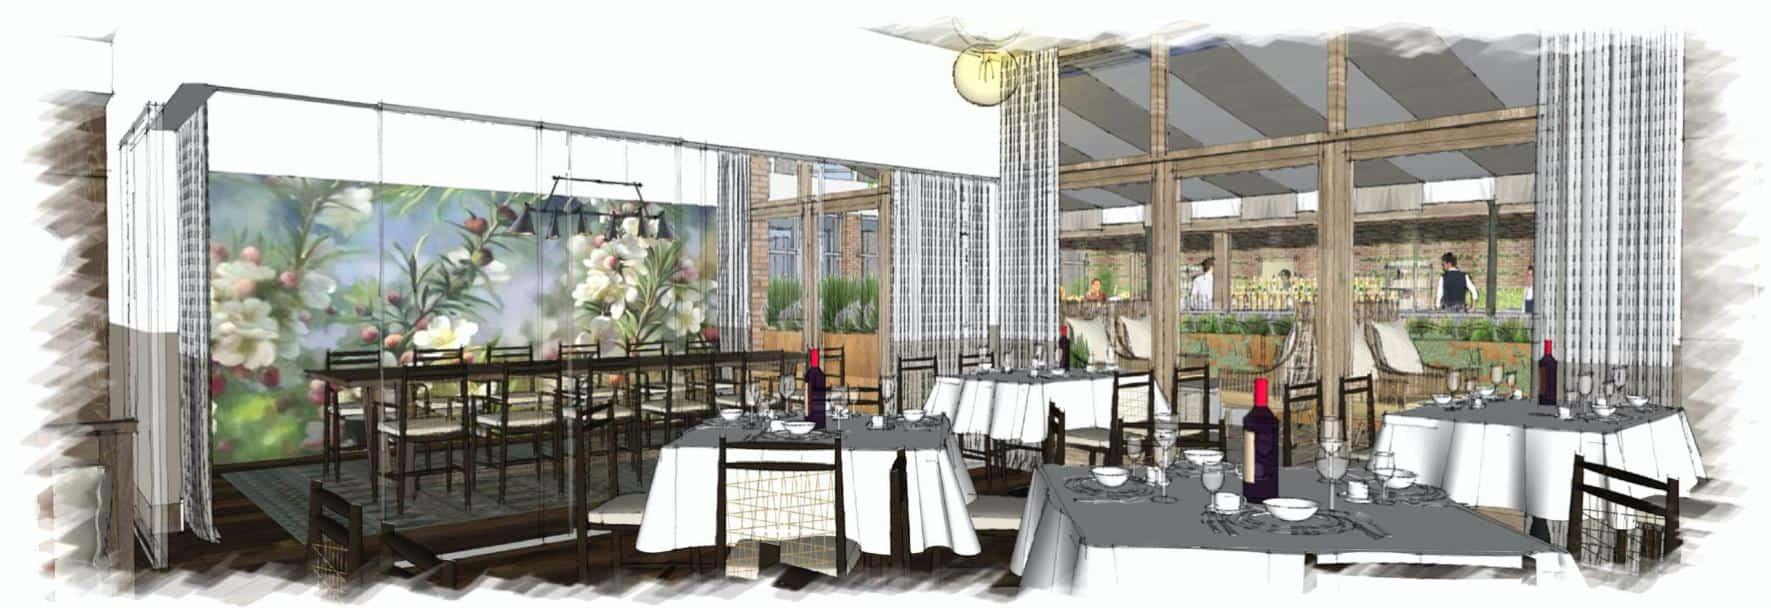 Artisan Waterfront Restaurant & Tavern in Traverse City